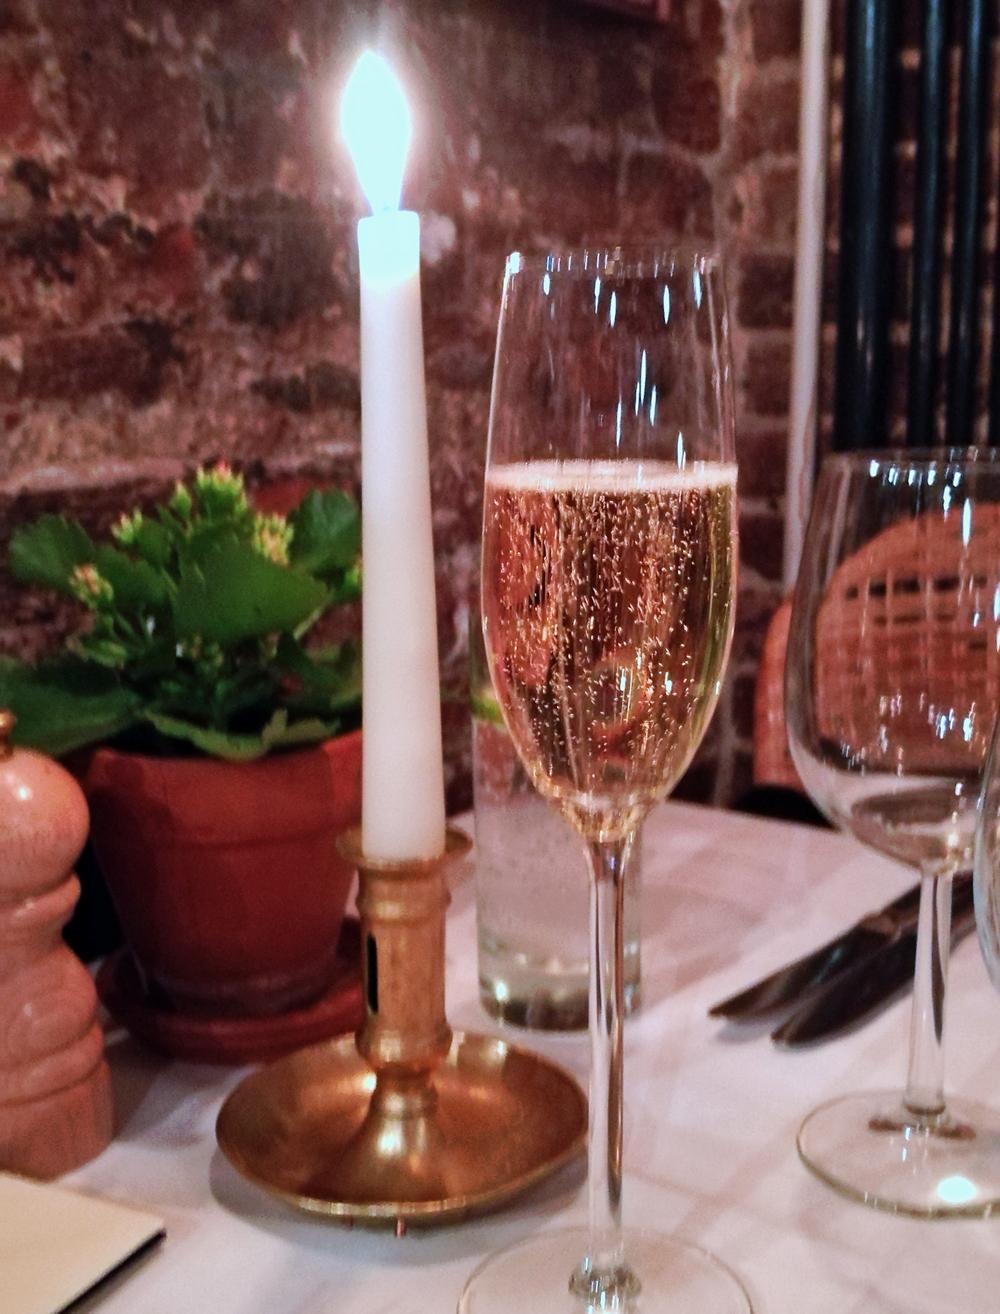 Cafe du Marche - Champagne